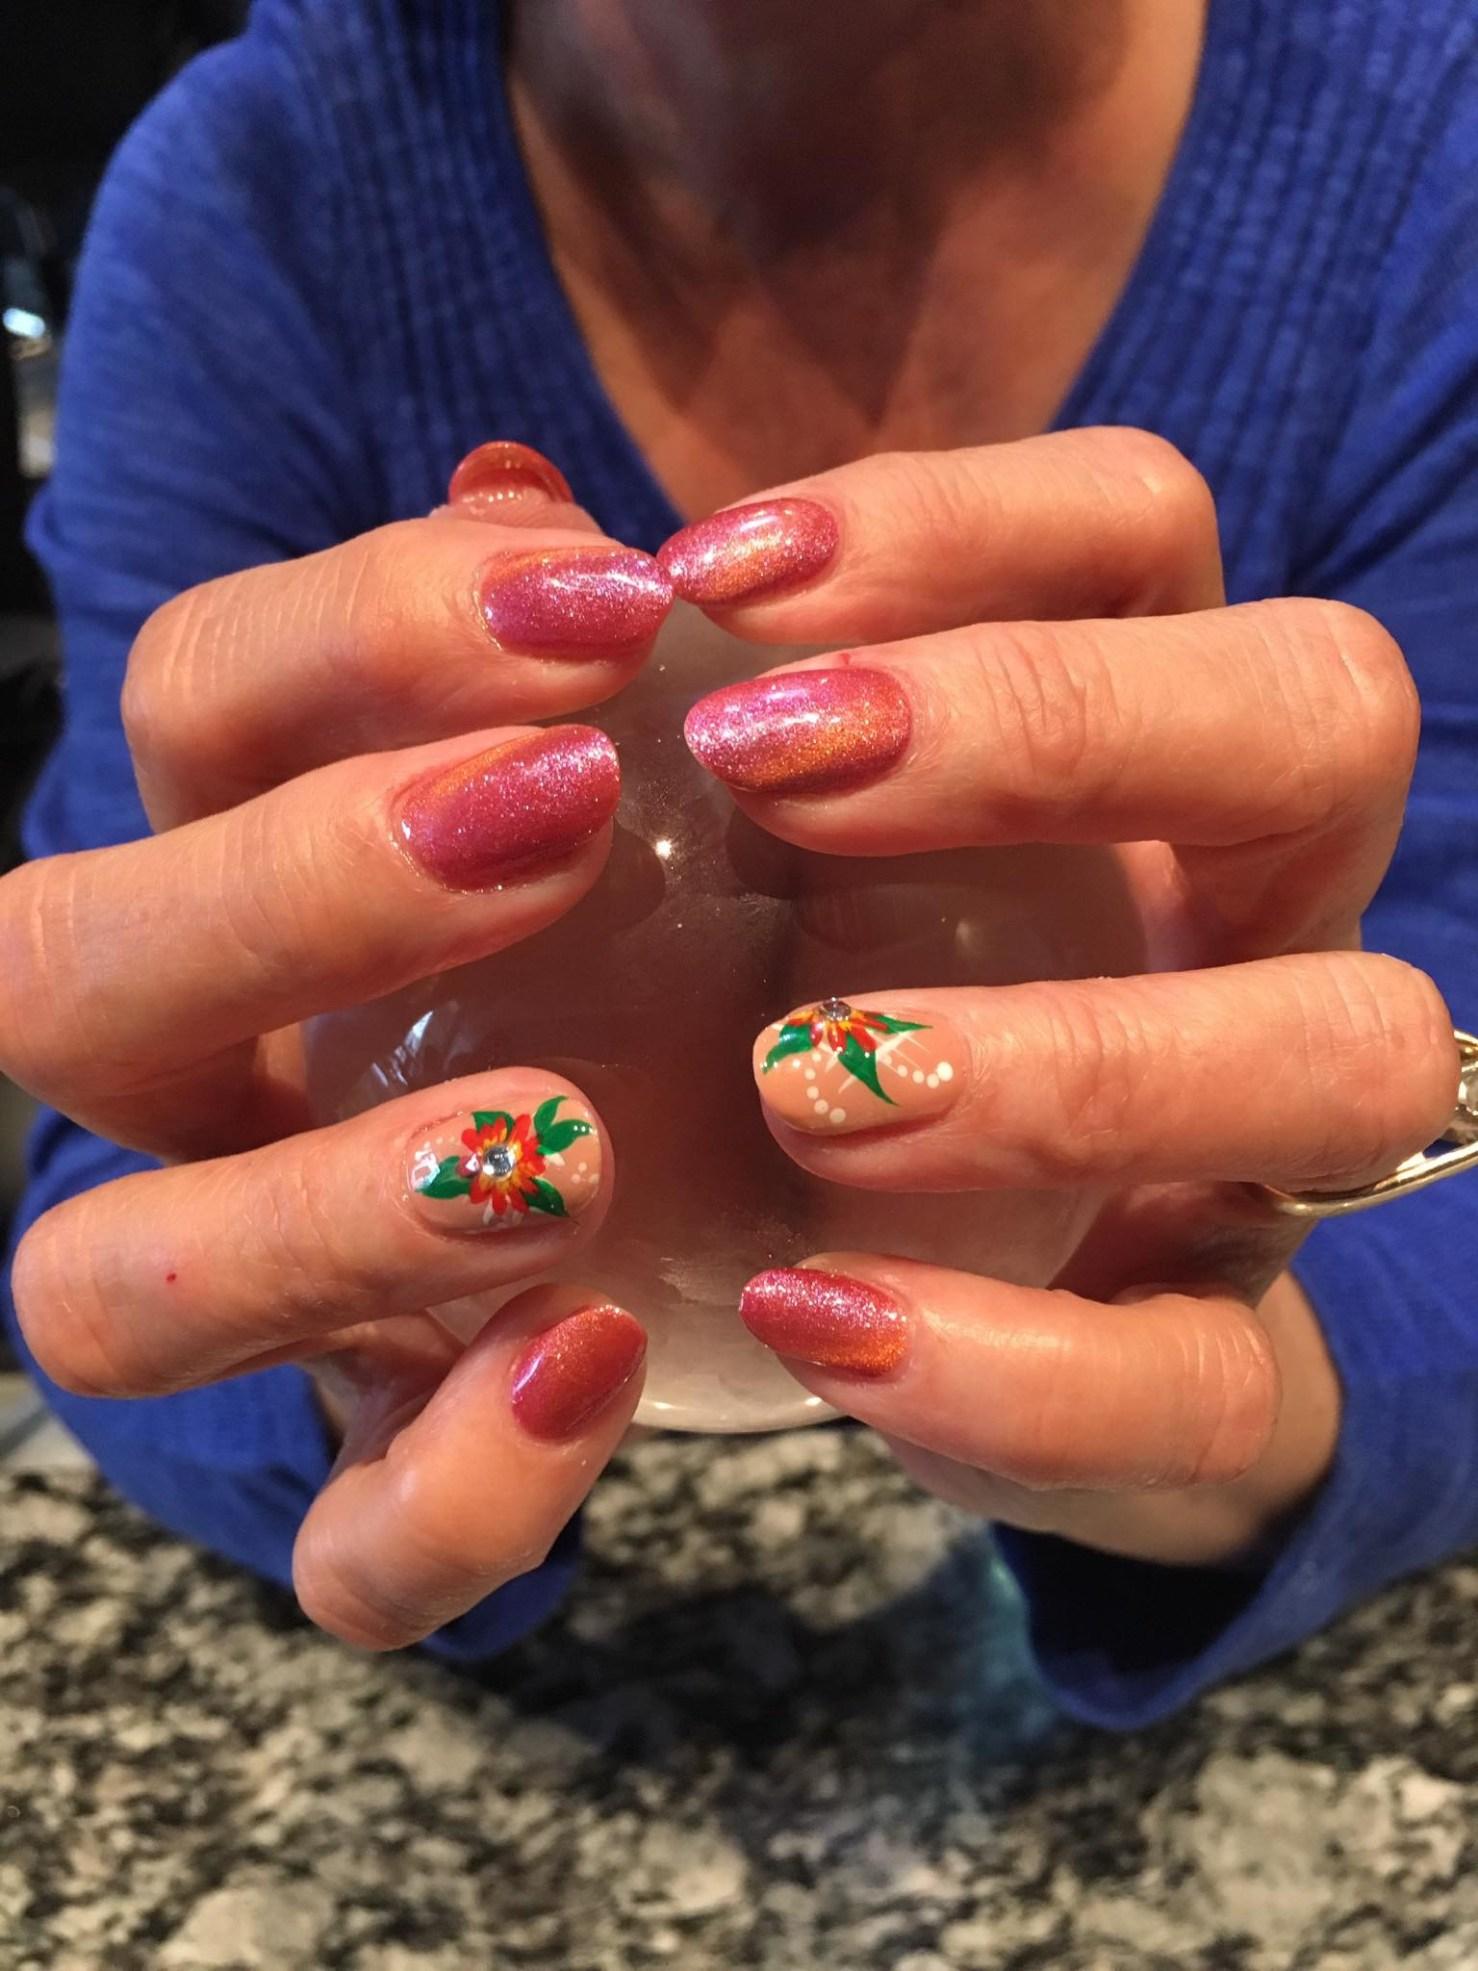 North Kansas City Gel Nail Salon - Gel Nails & Spa